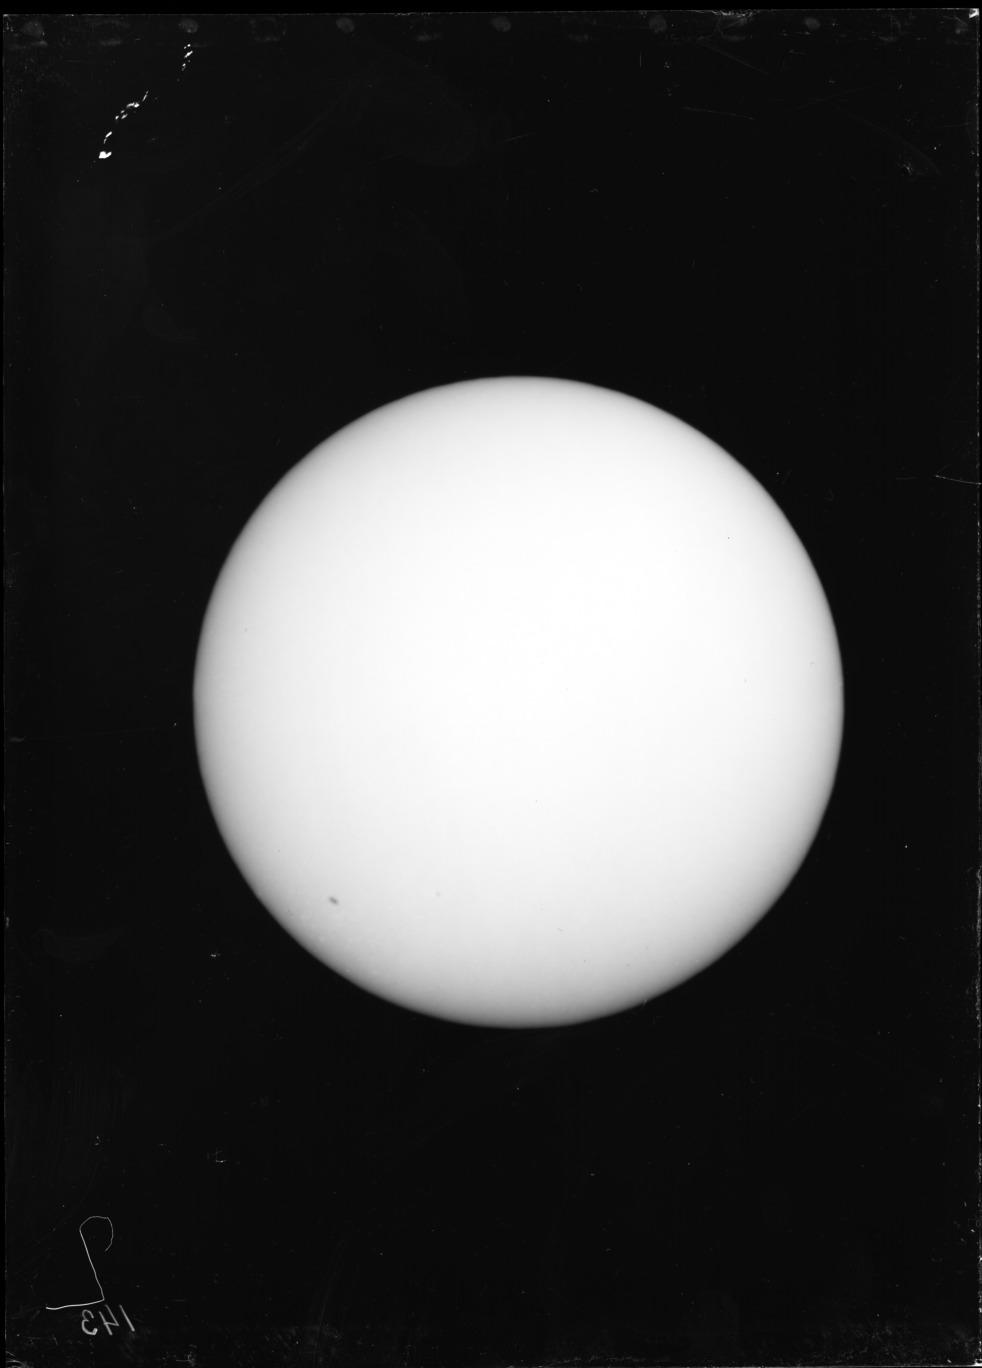 AGlV143